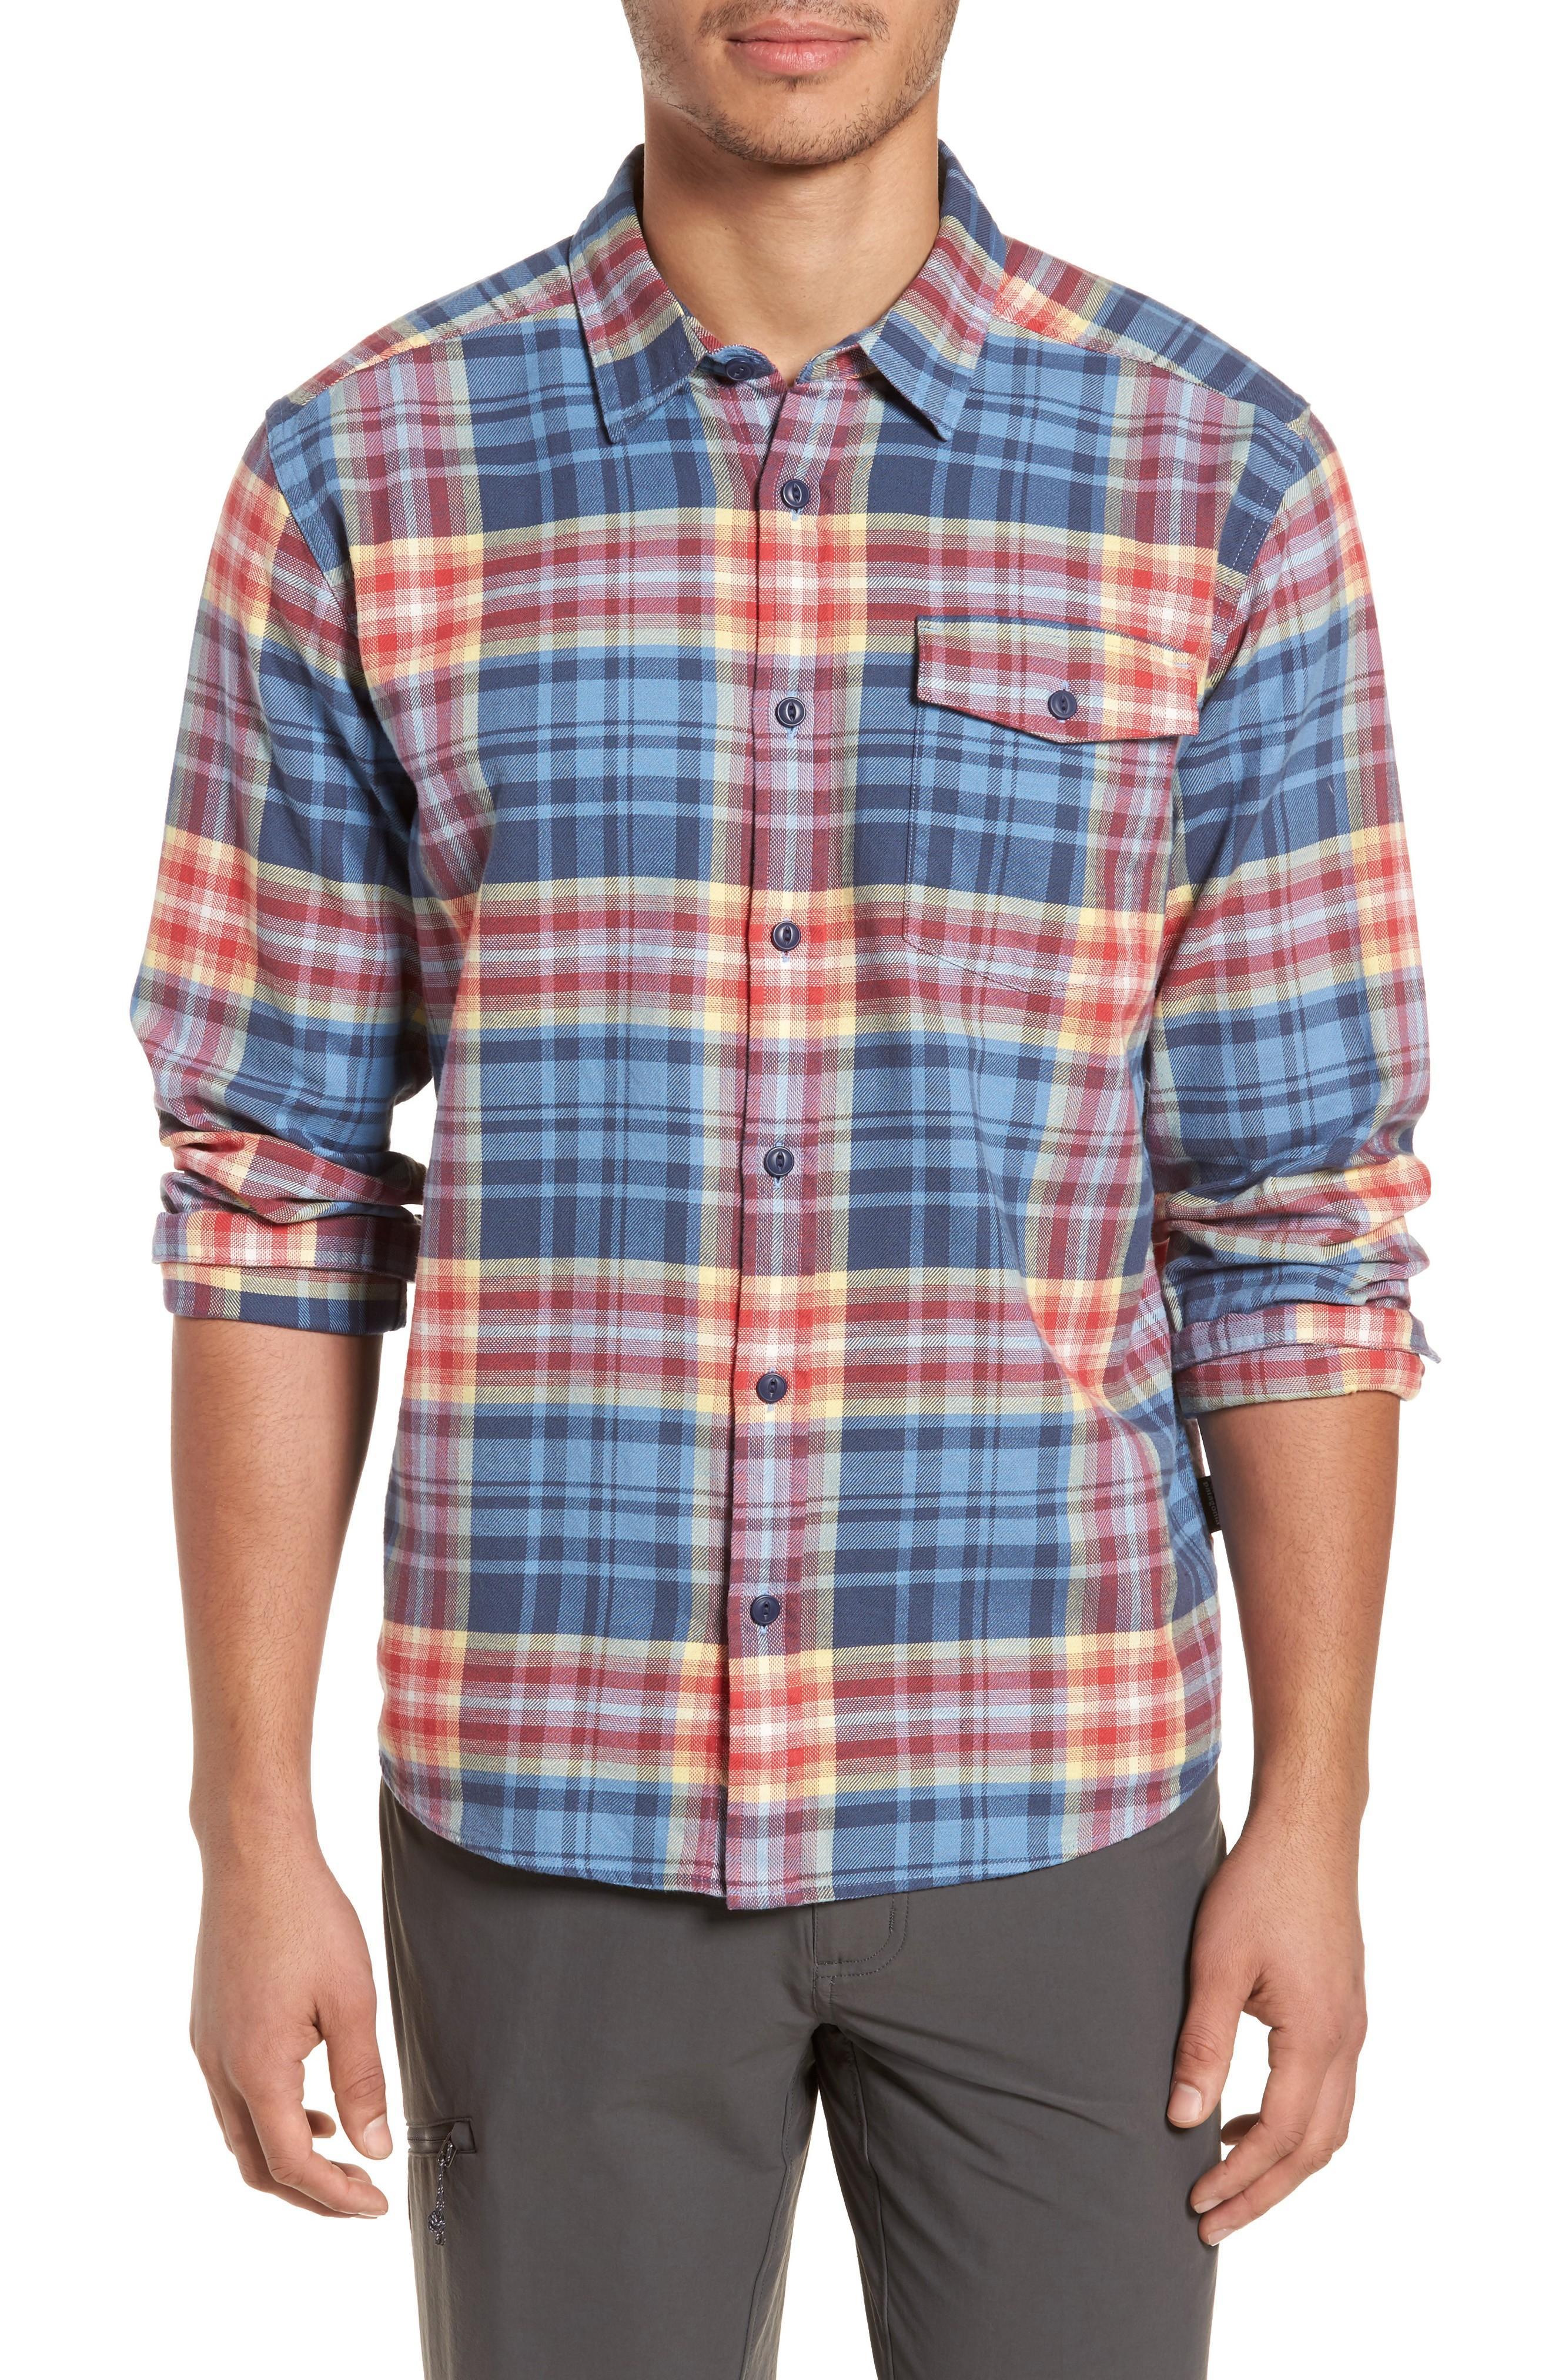 Patagonia Regular Fit Organic Cotton Flannel Shirt In Railroad Blue